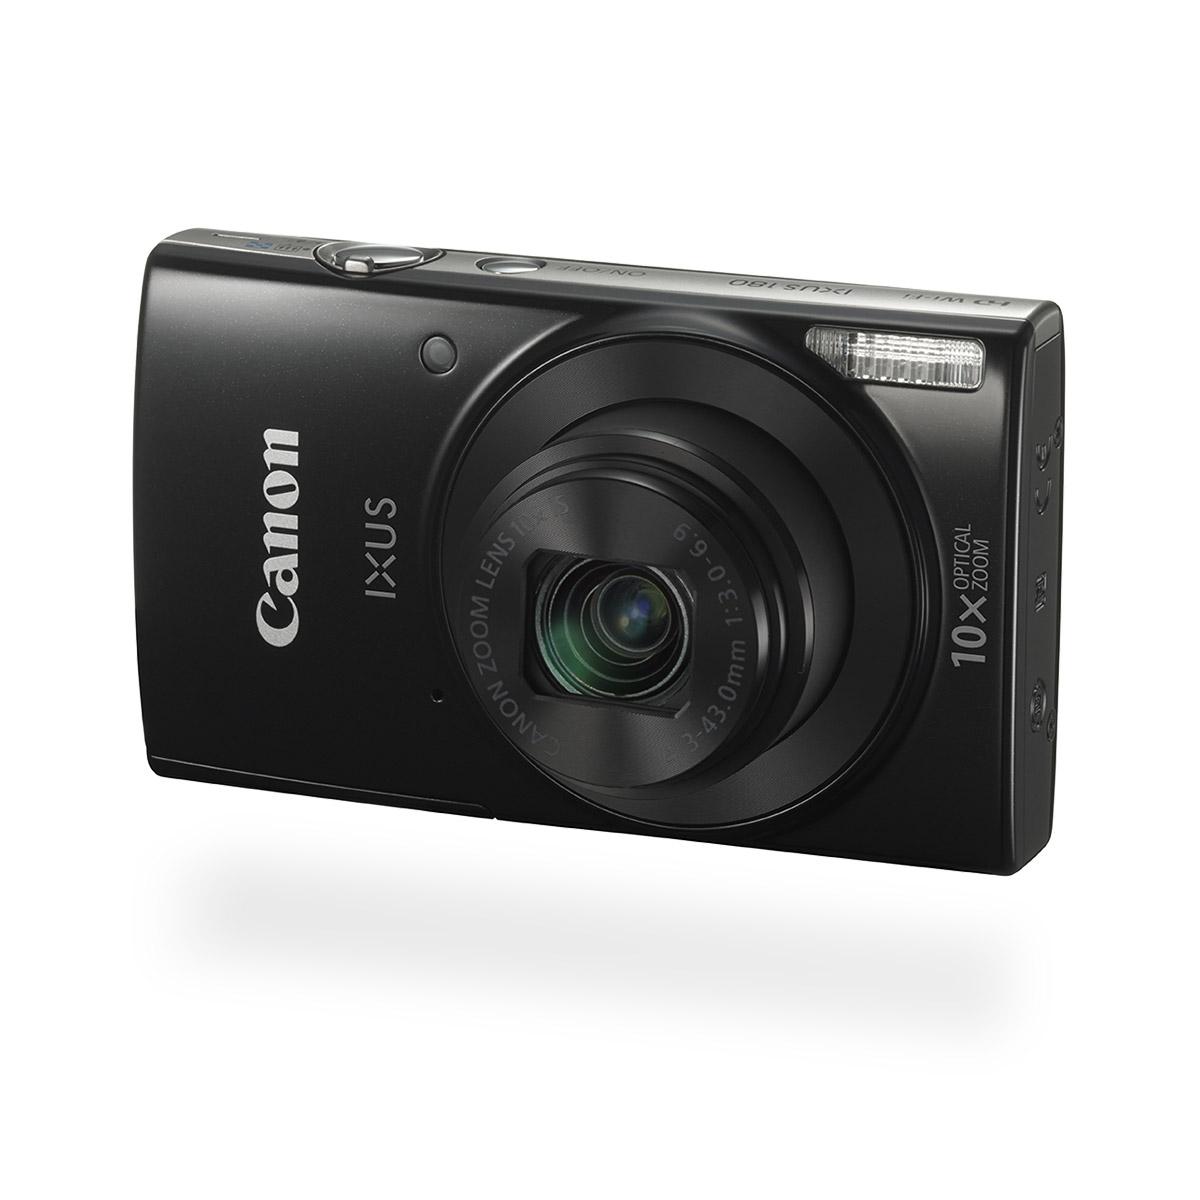 Canon IXUS 180 digital compact camera black front angled